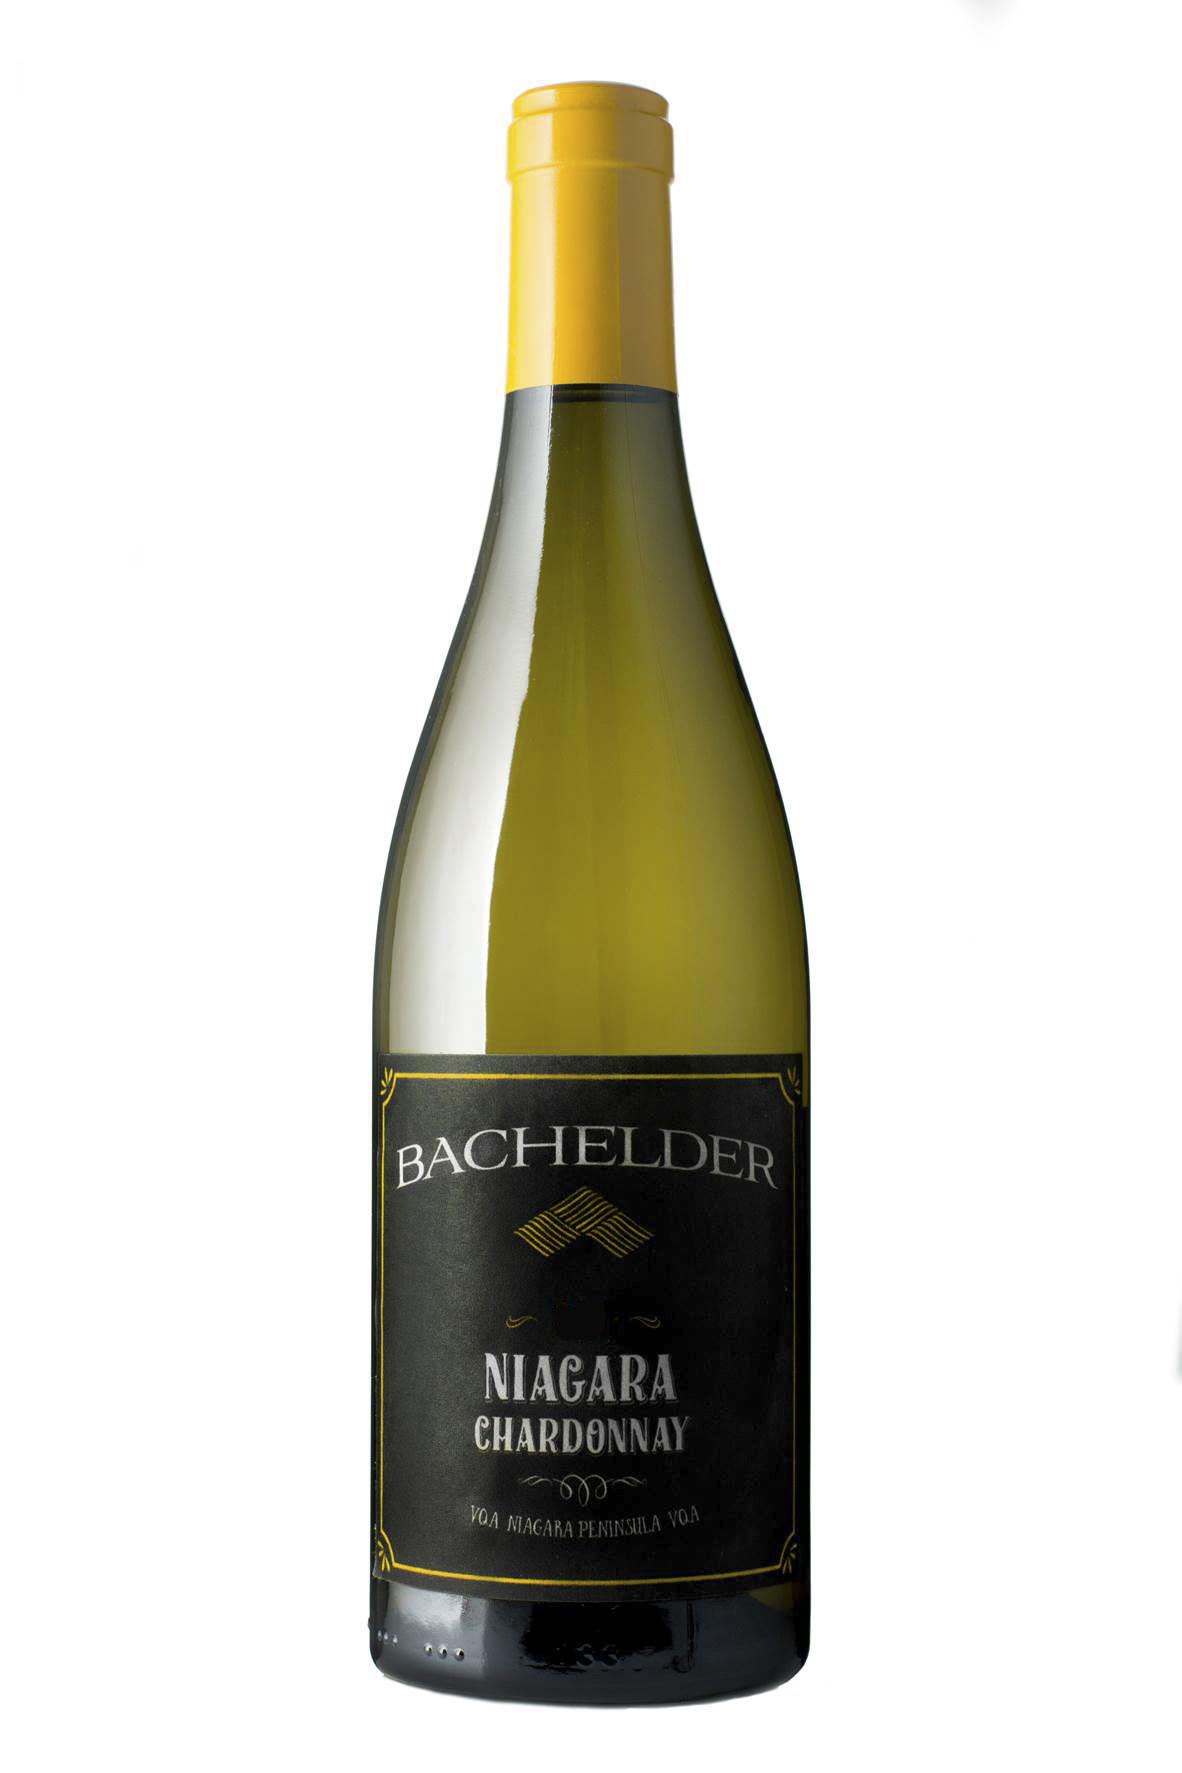 Bachelder, Niagara Chardonnay 2014